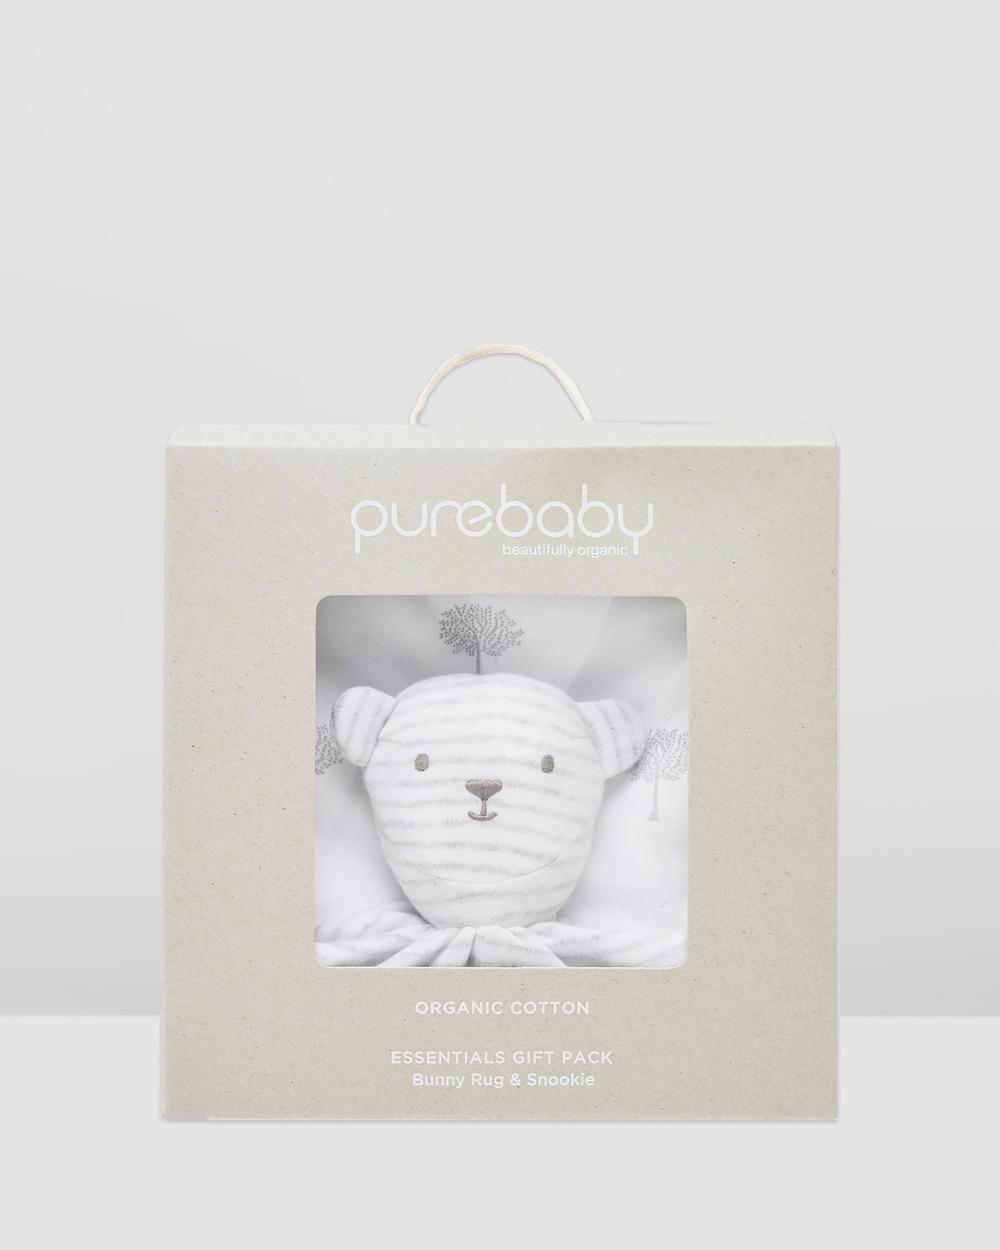 Purebaby Bunny Rug Snookie Pack Wraps & Blankets Pale Grey Tree